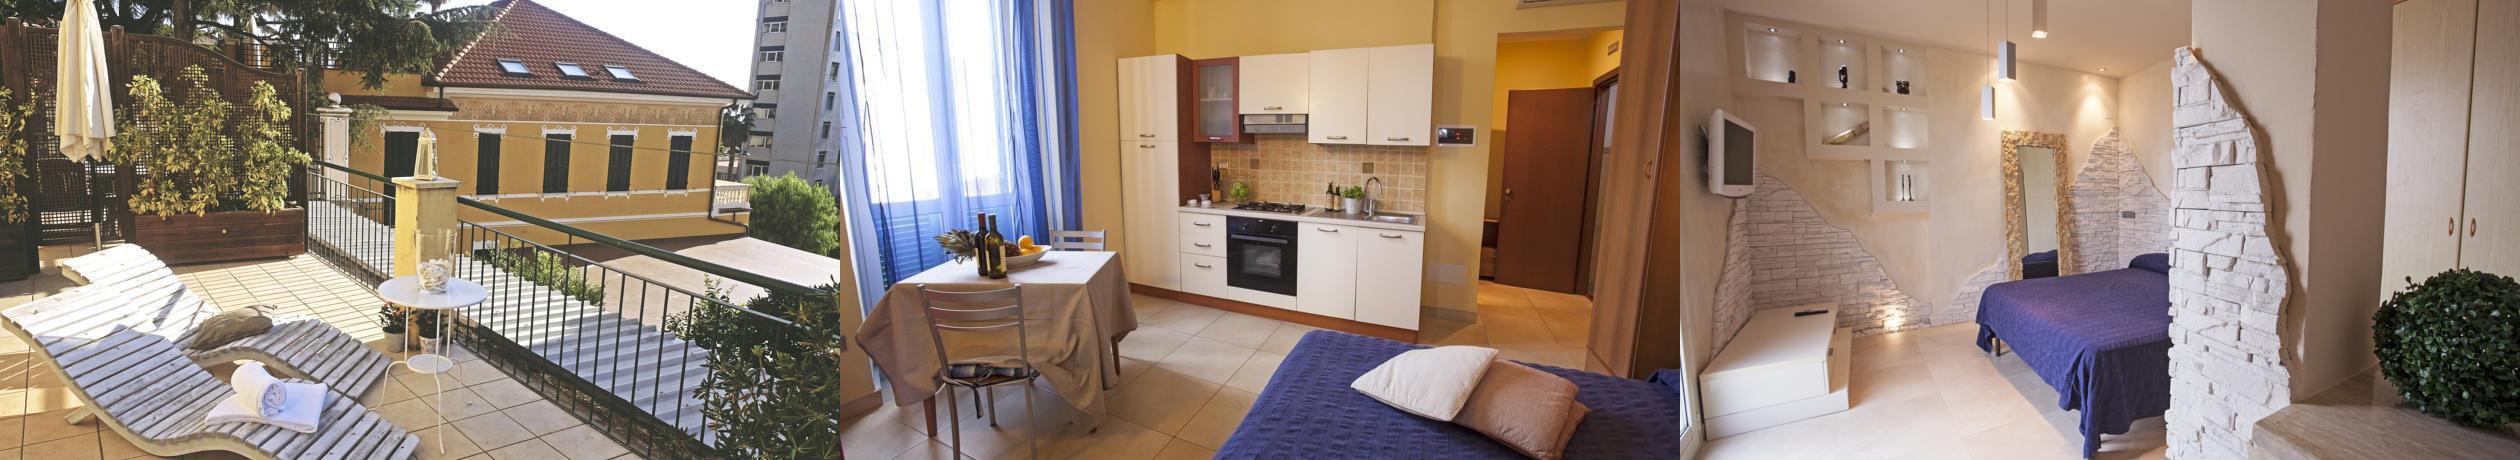 Residence Conchiglia Aparthotel